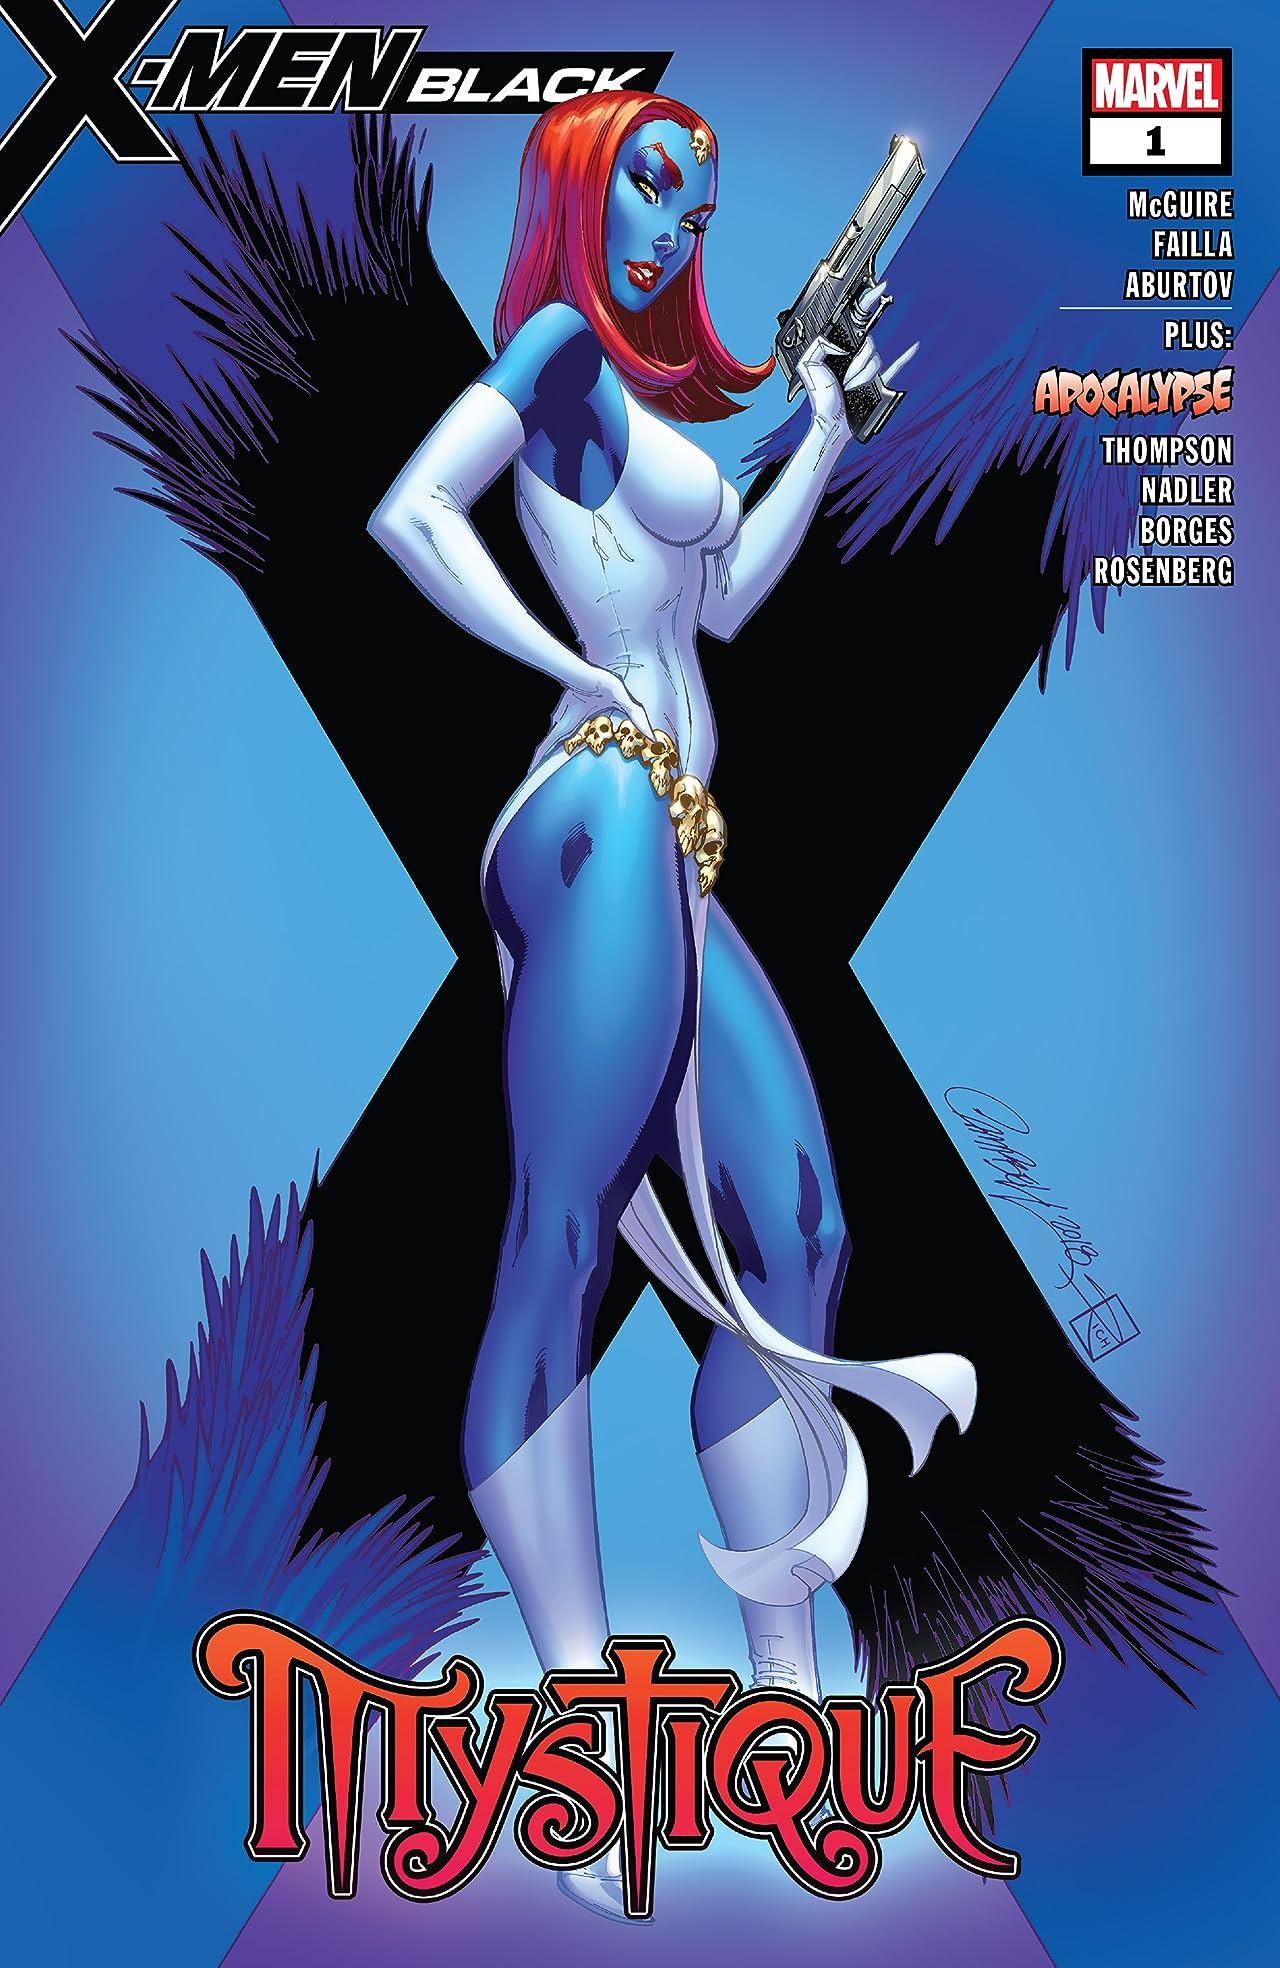 X-Men : Black - Mystique